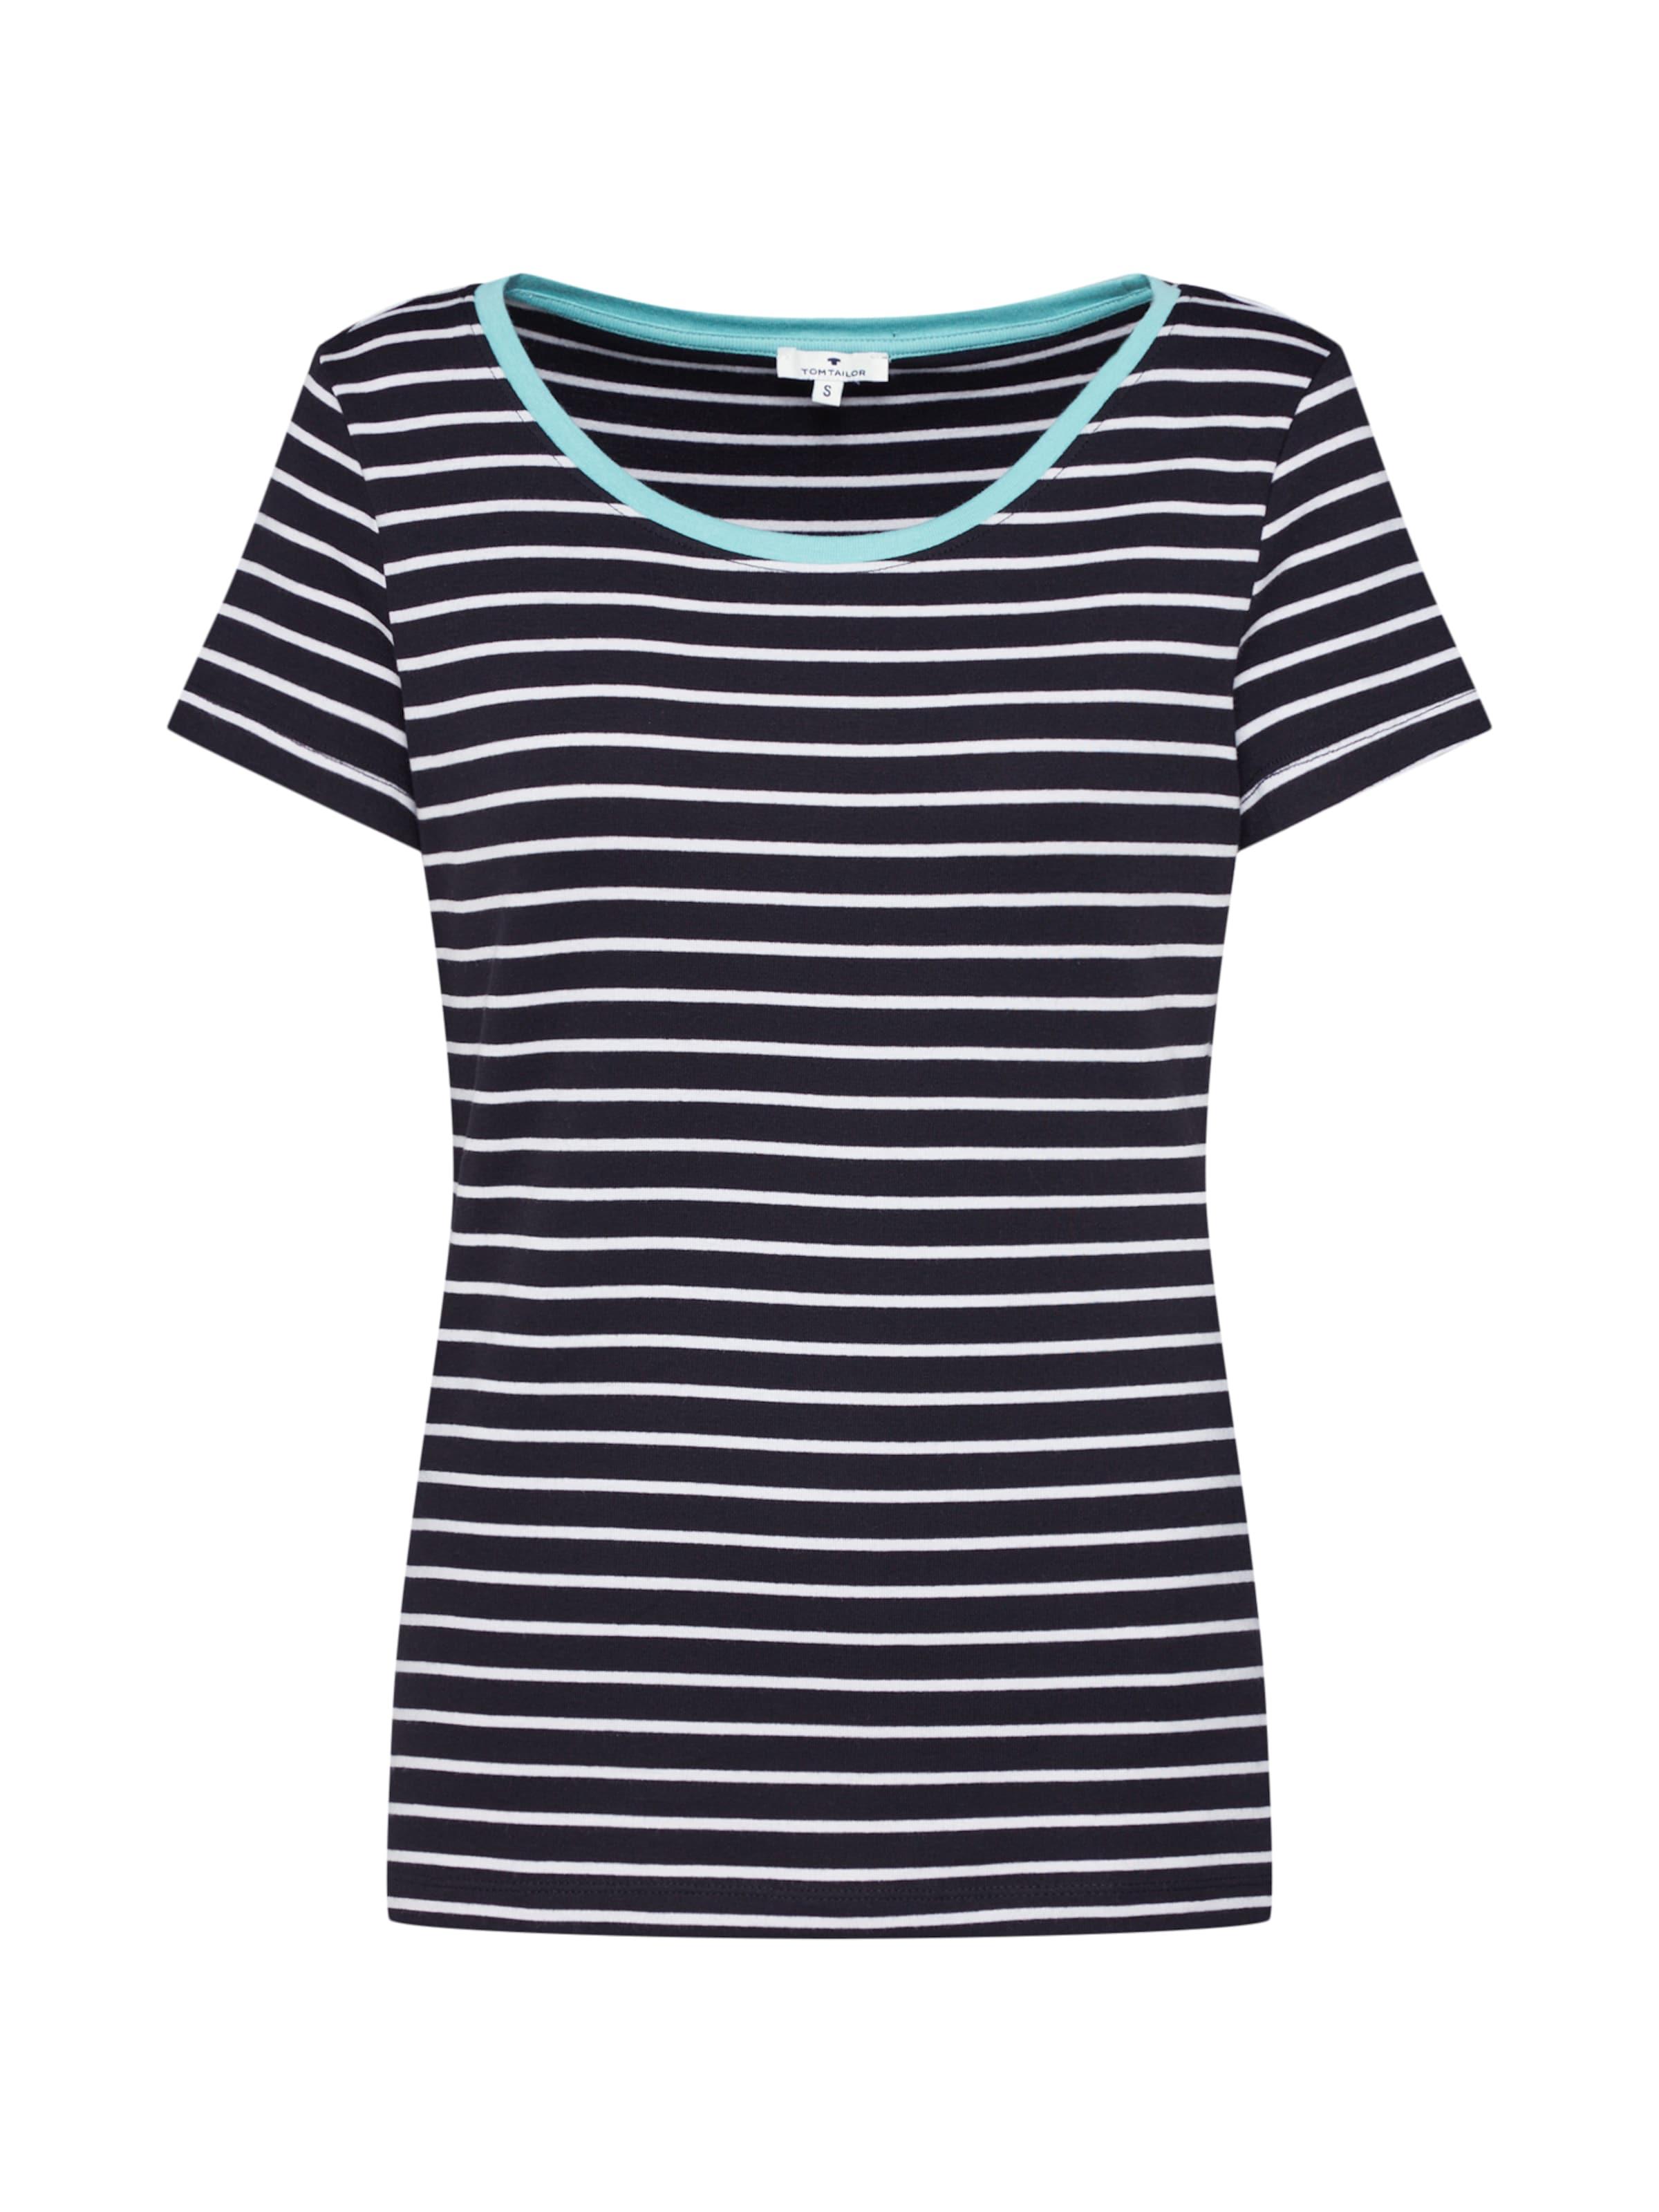 shirt Tom T Tailor Blanc En TurquoiseNoir OXuiZTPk